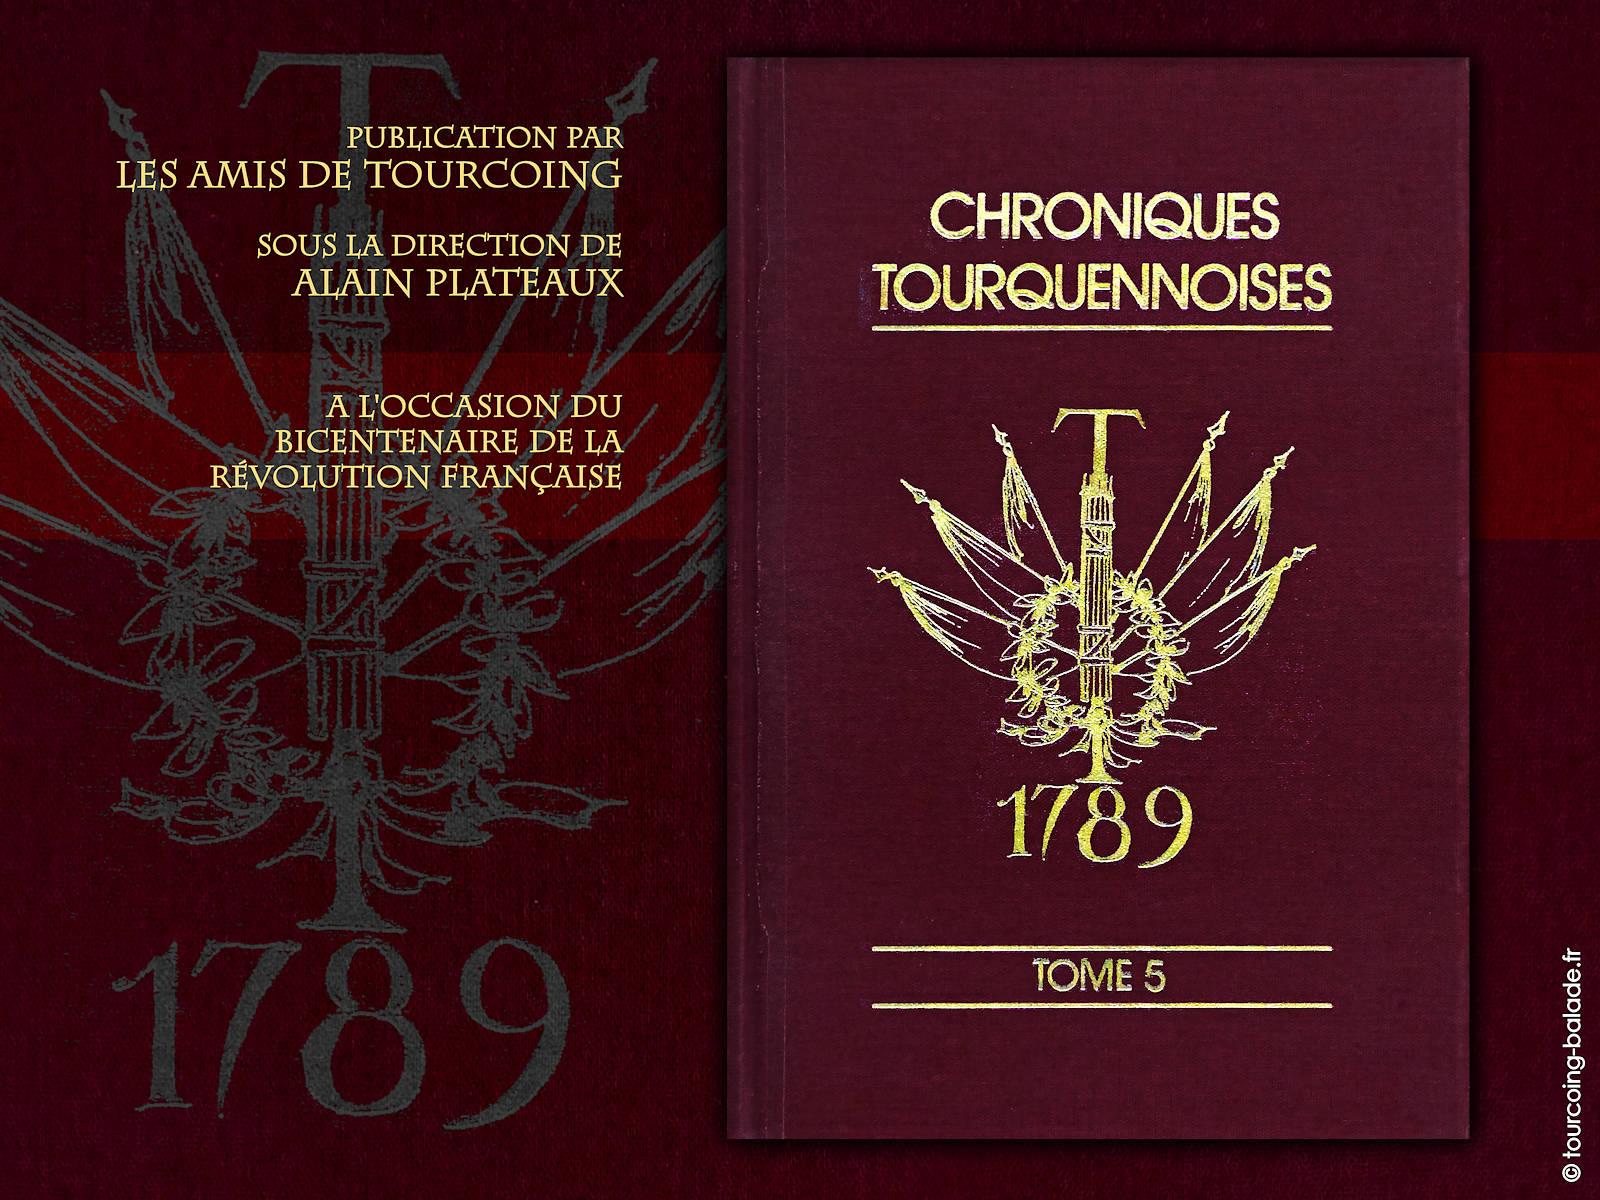 Chroniques tourquennoises, Tome 5